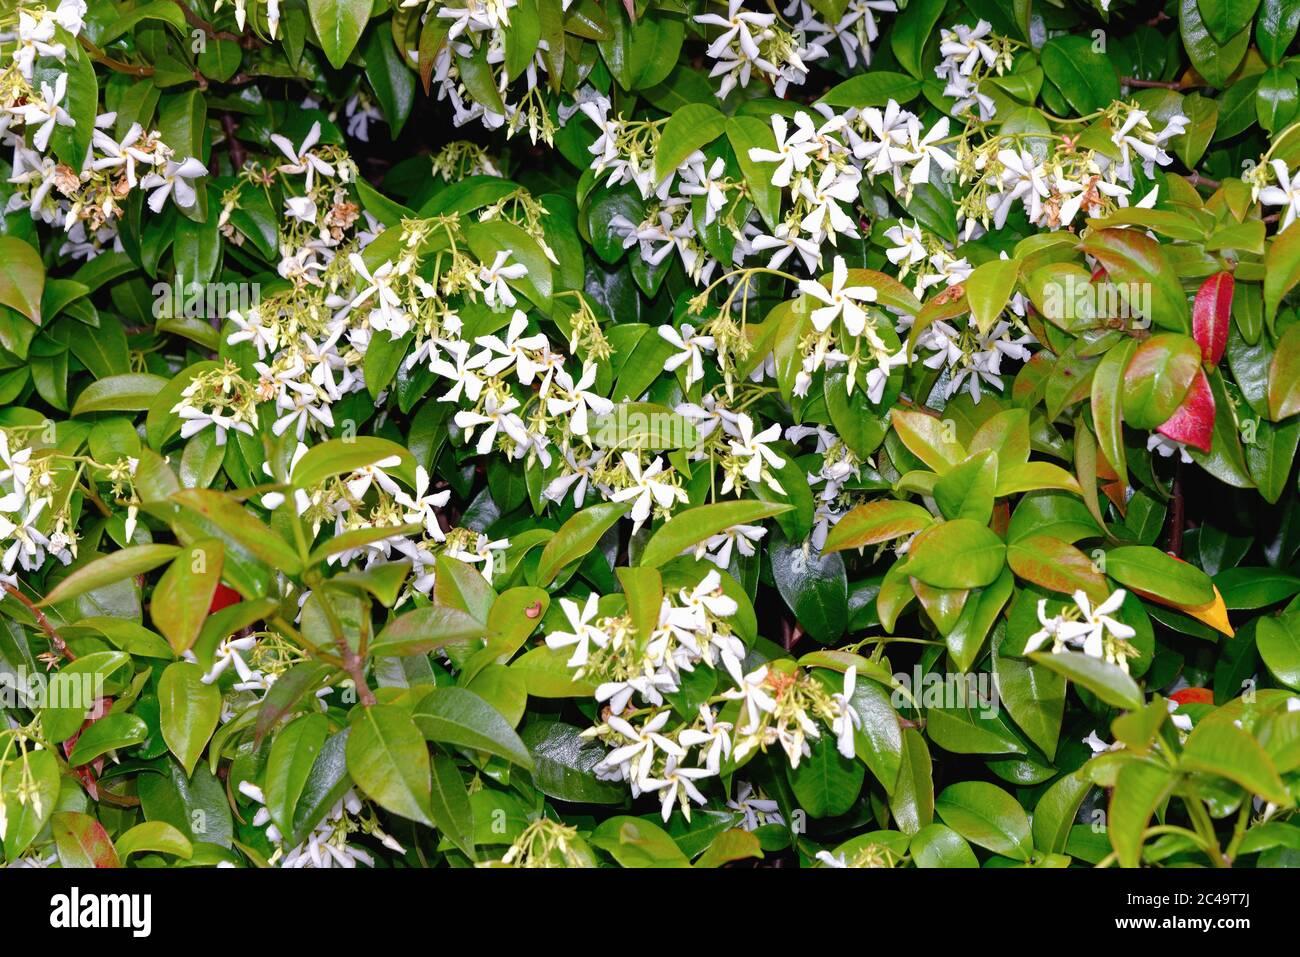 Close up of a flowering Star Jasmine, Trachelospermum jasminoides, shrub Stock Photo